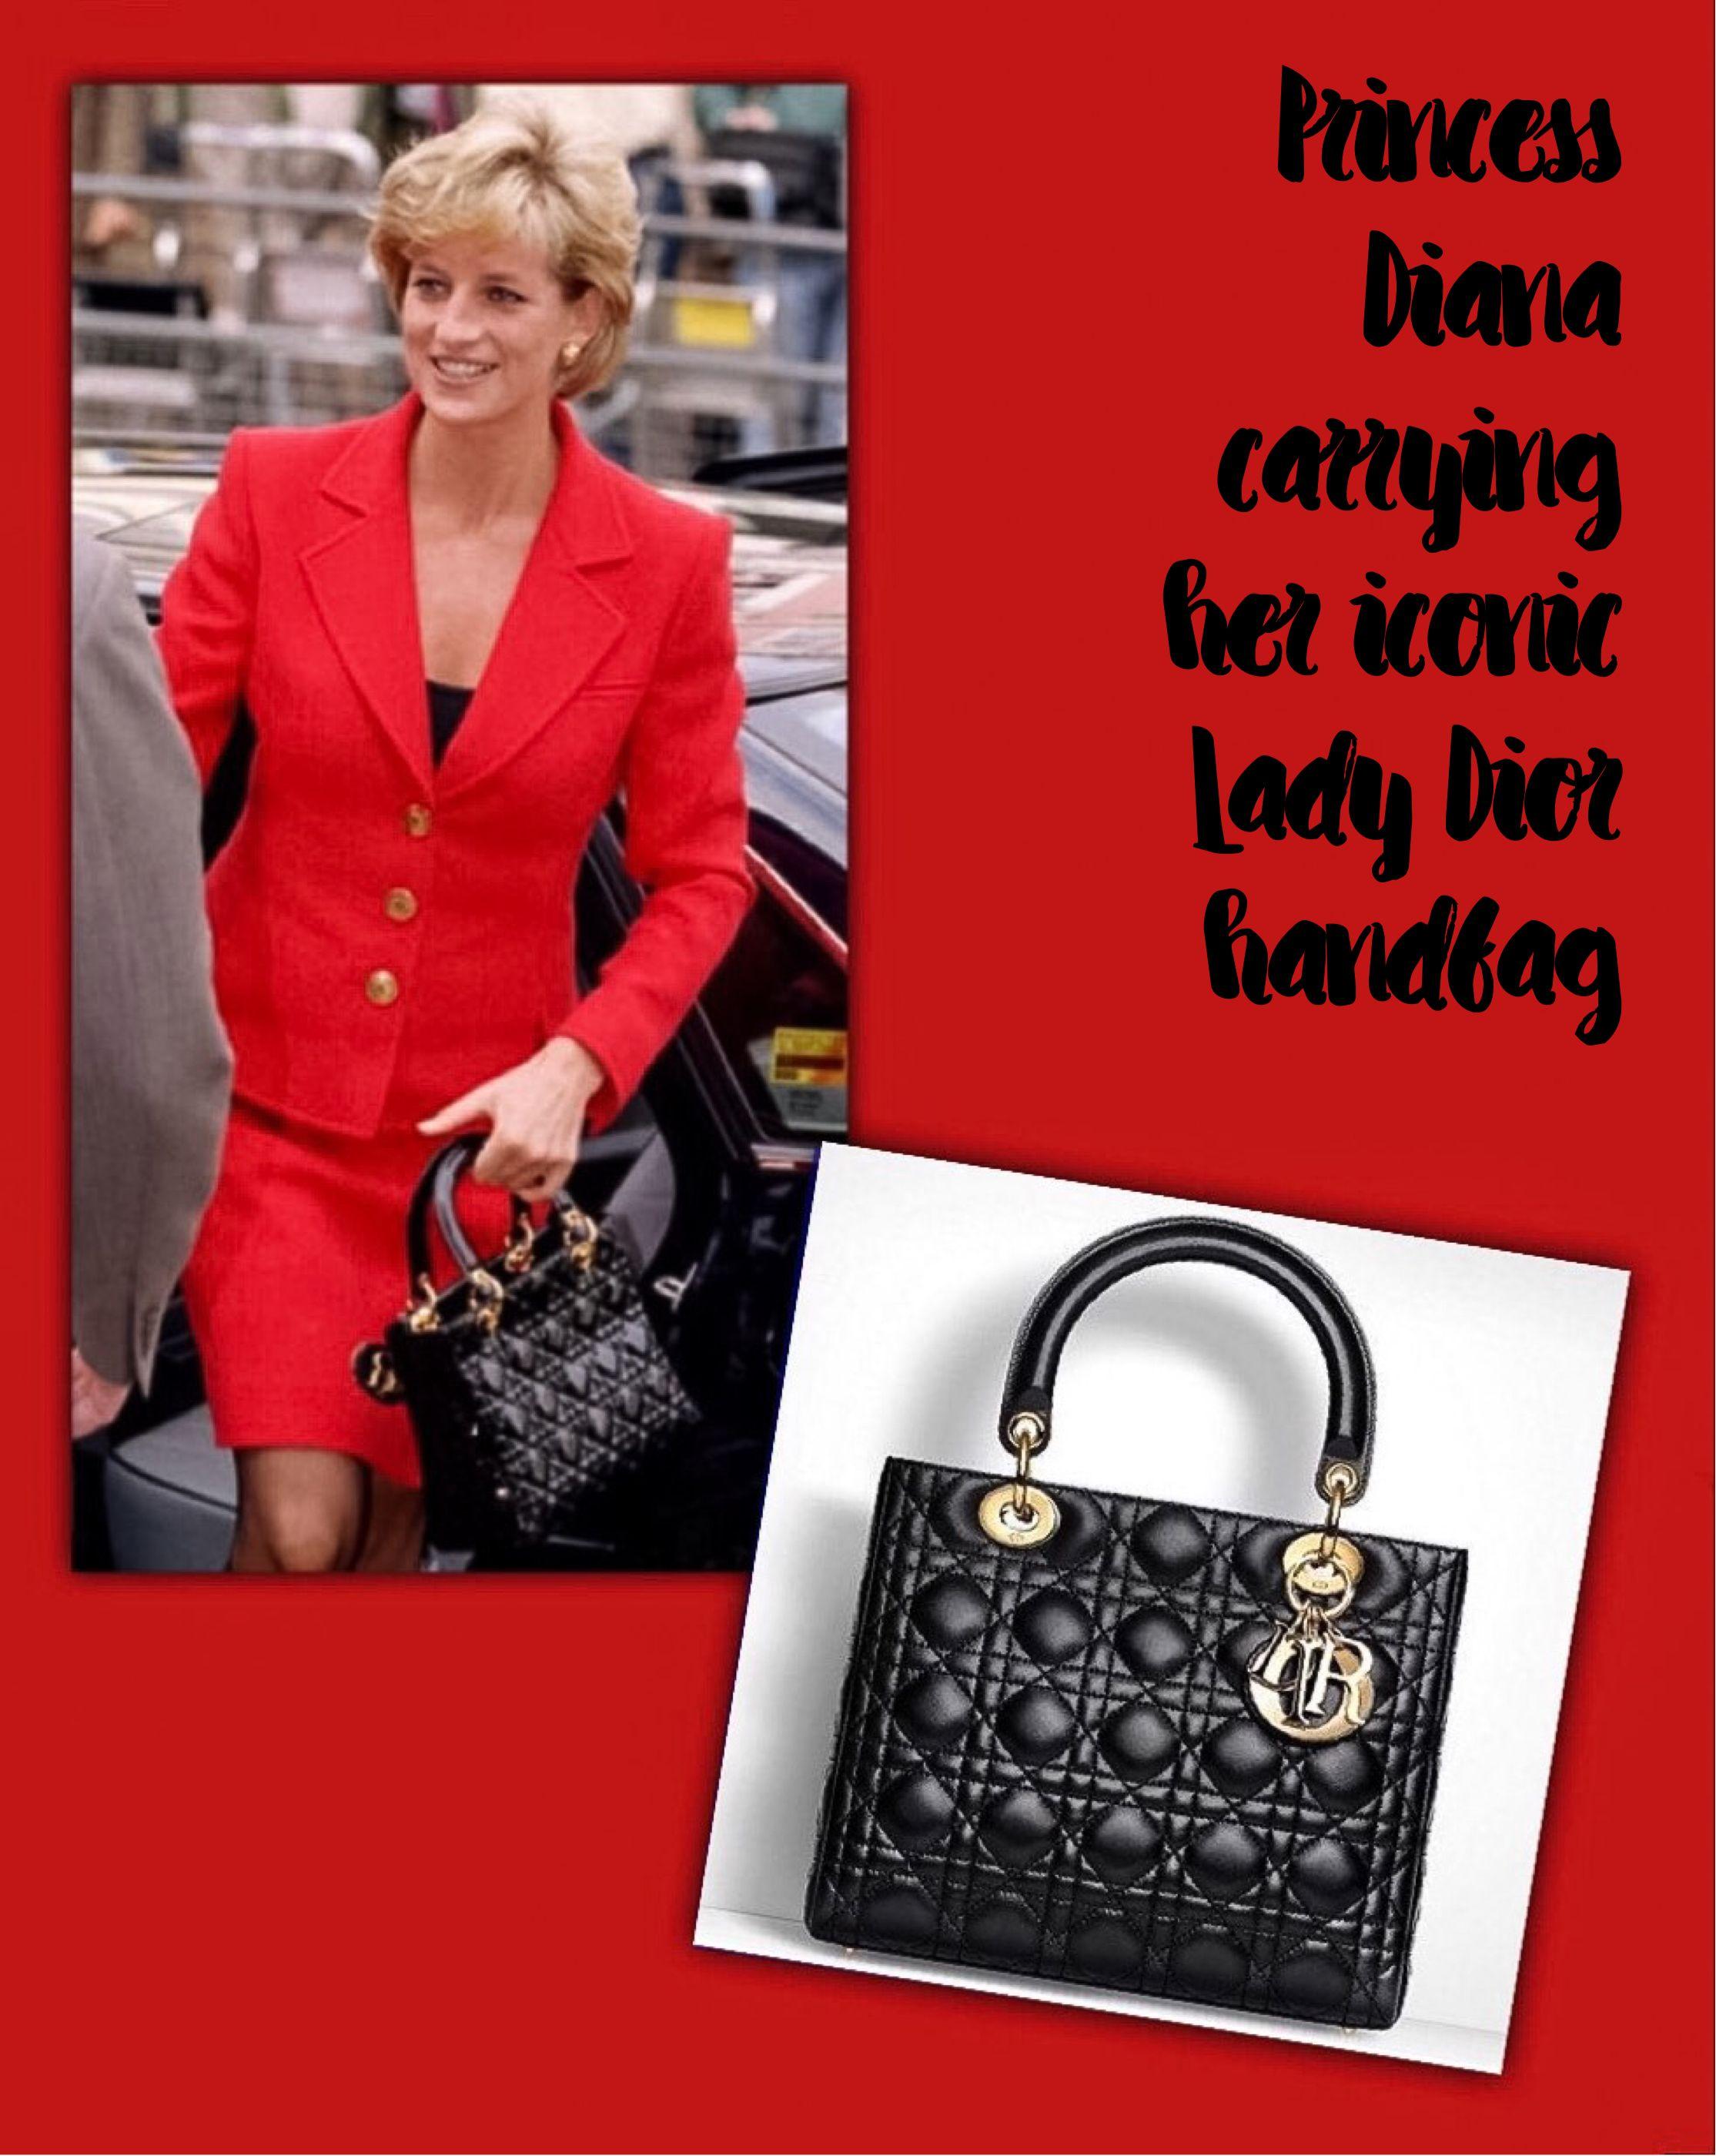 3c9ba3b94ce1 Princess Diana carrying her iconic Lady Dior handbag ...